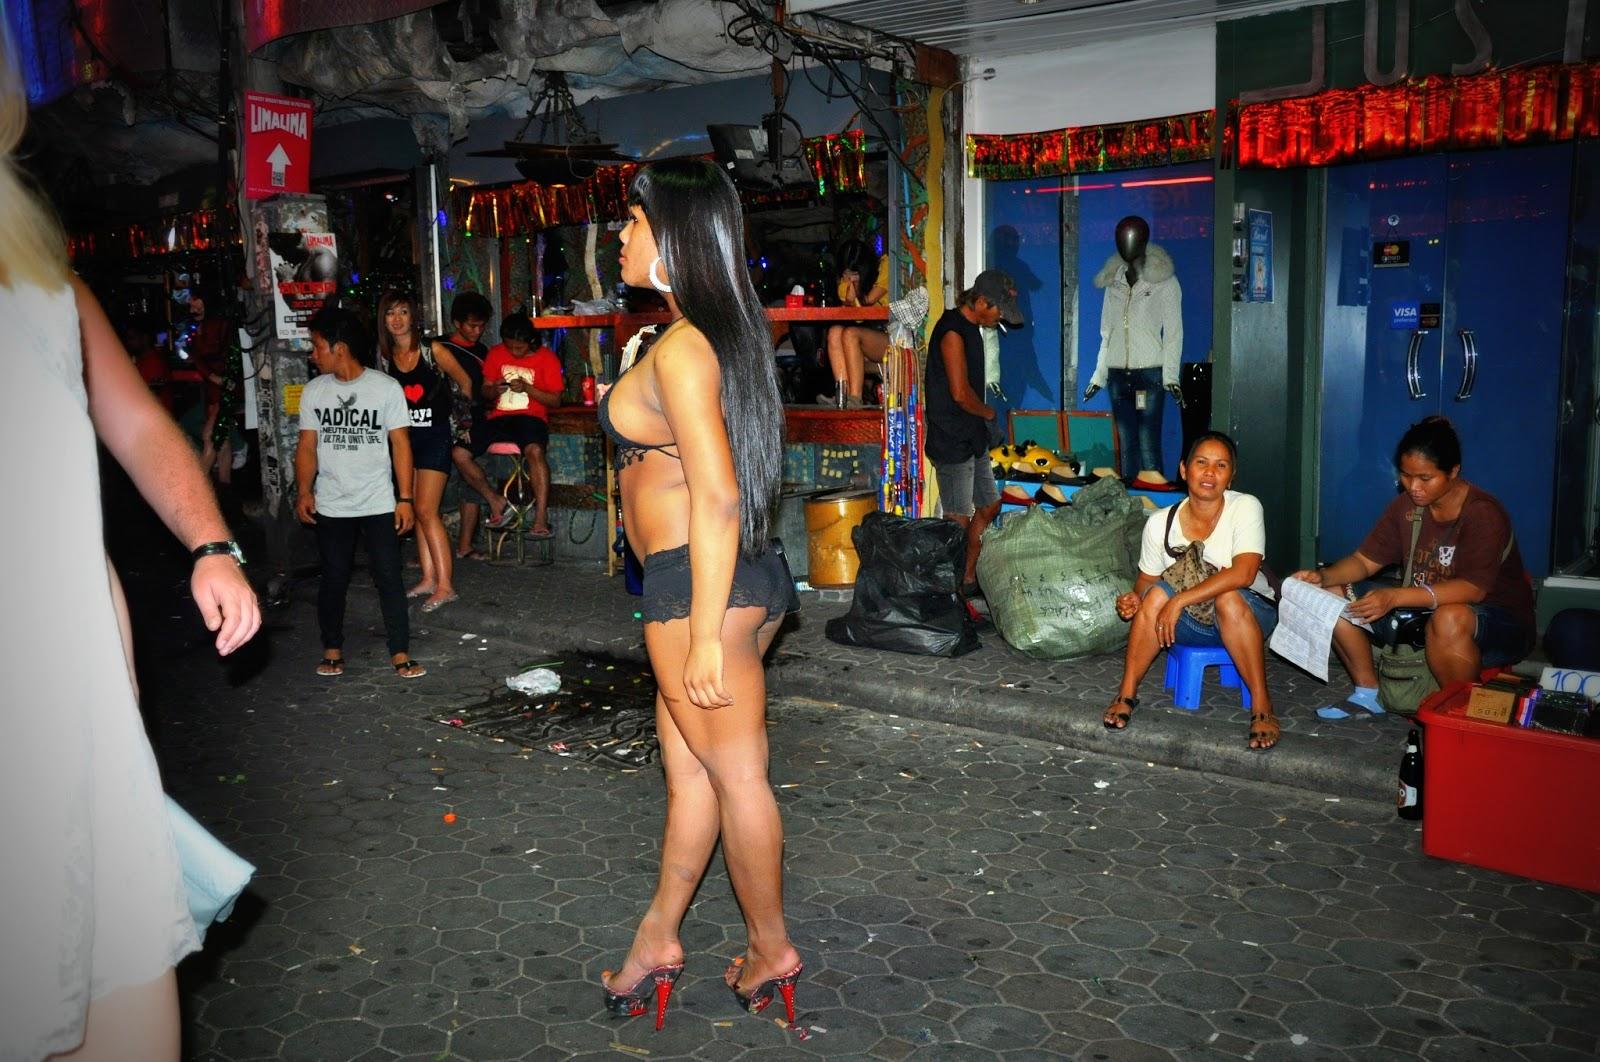 Фото Местных Шлюх В Паттайе